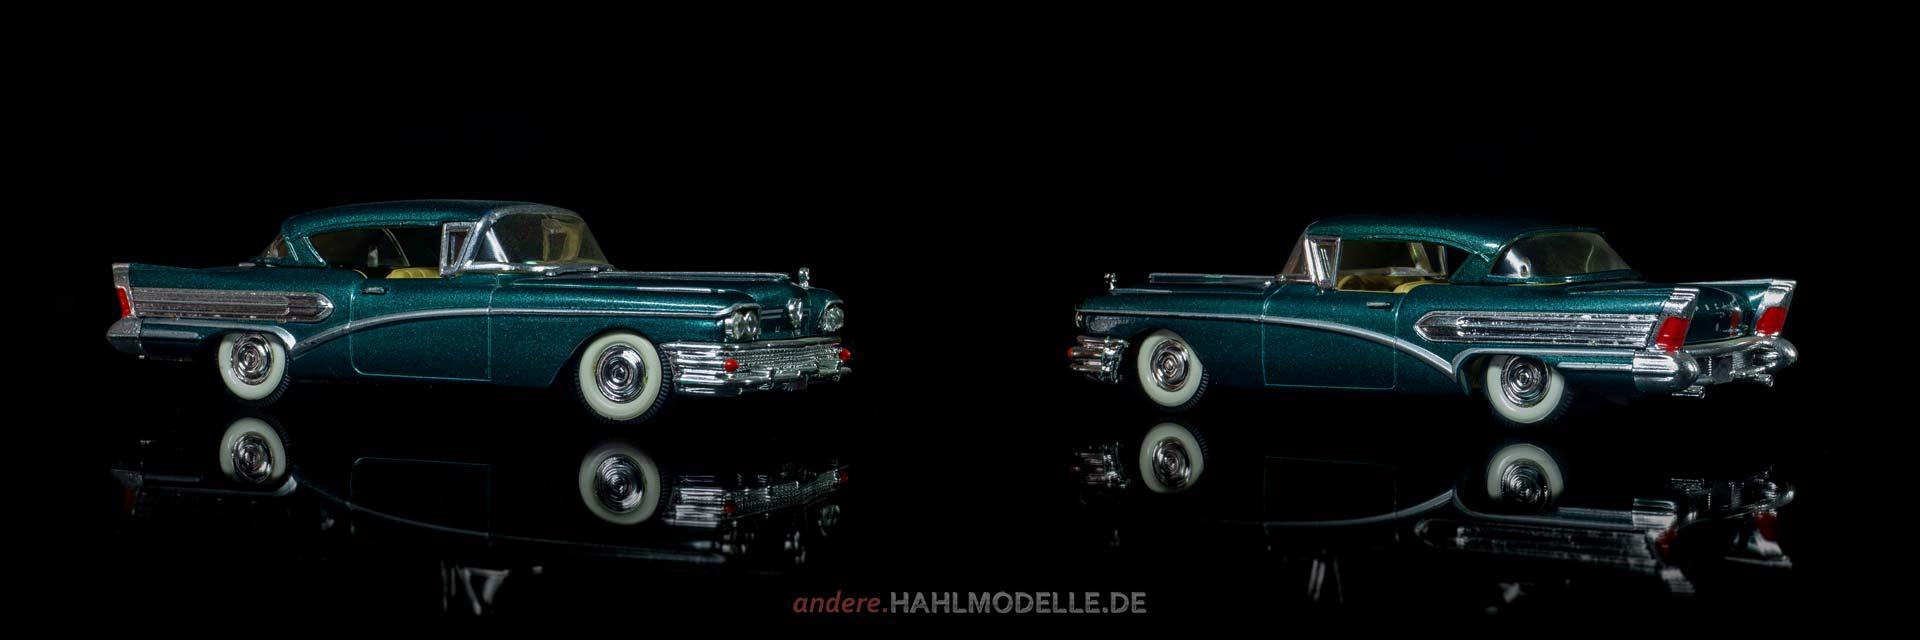 Buick Serie 75 Roadmaster Riviera Limited Hardtop Coupé | Coupé | Vitesse | 1:43 | www.andere.hahlmodelle.de